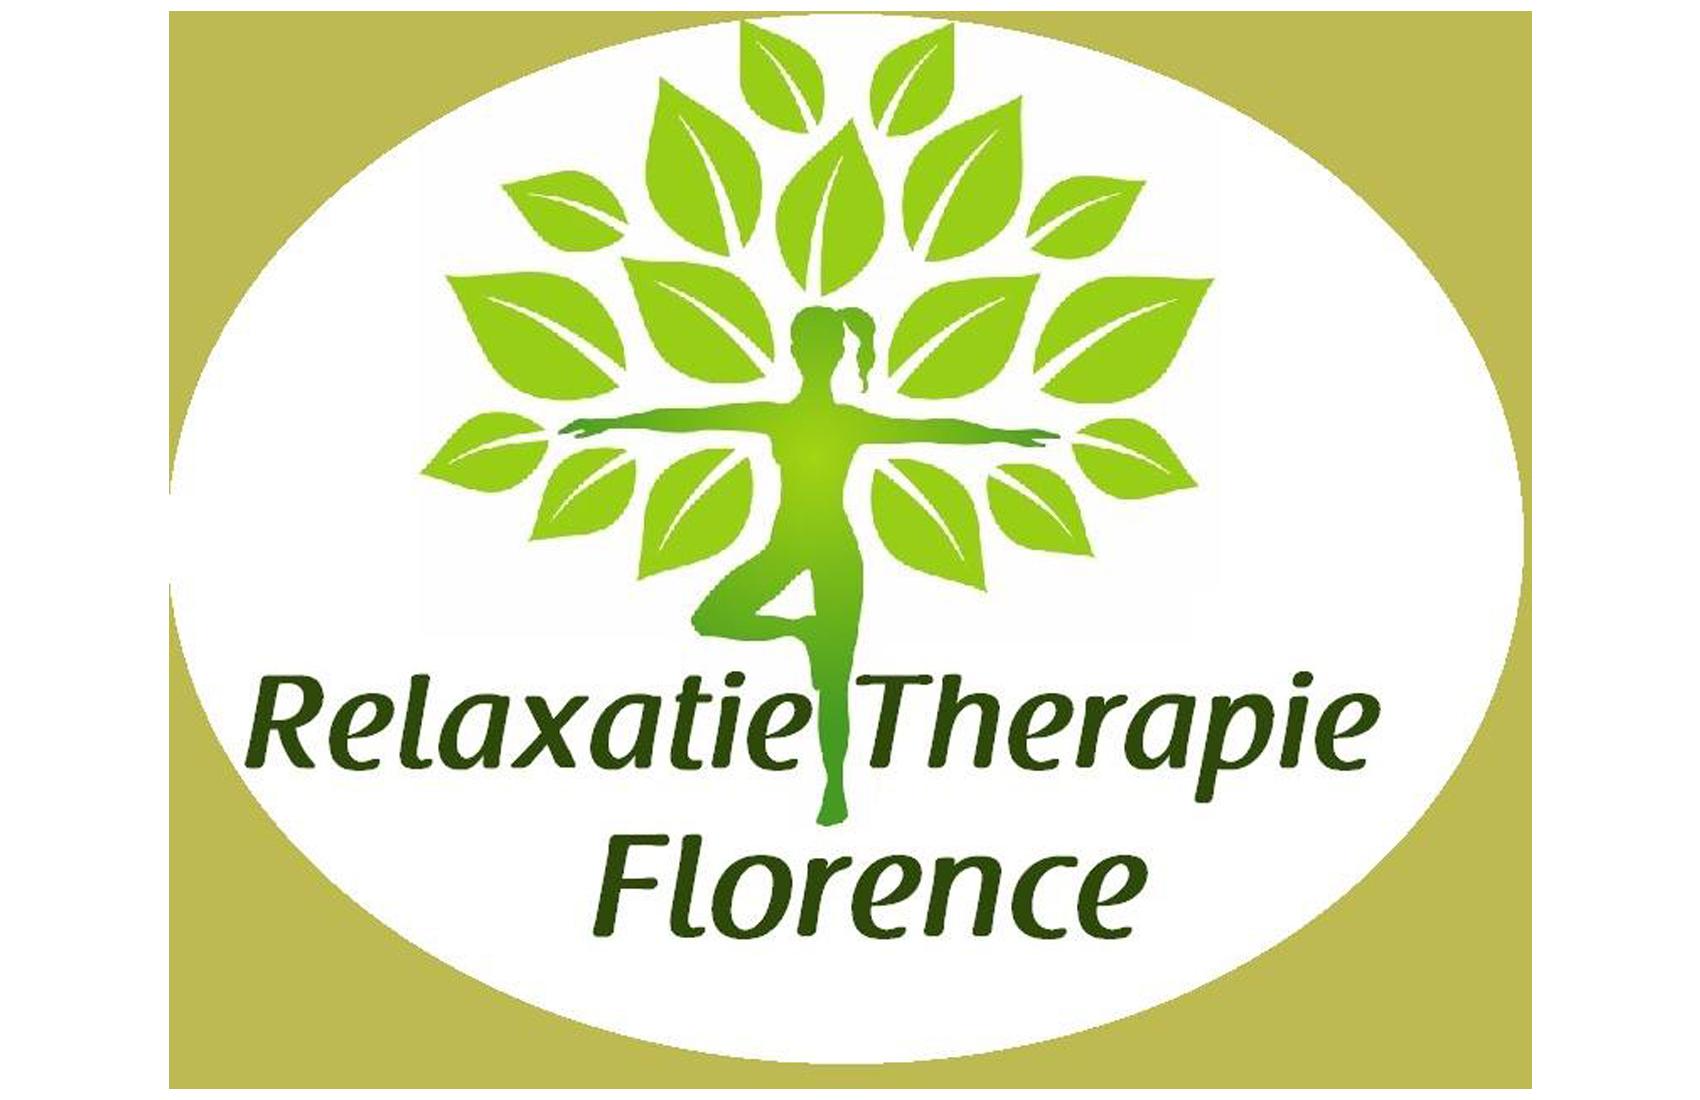 Relaxatietherapie Florence